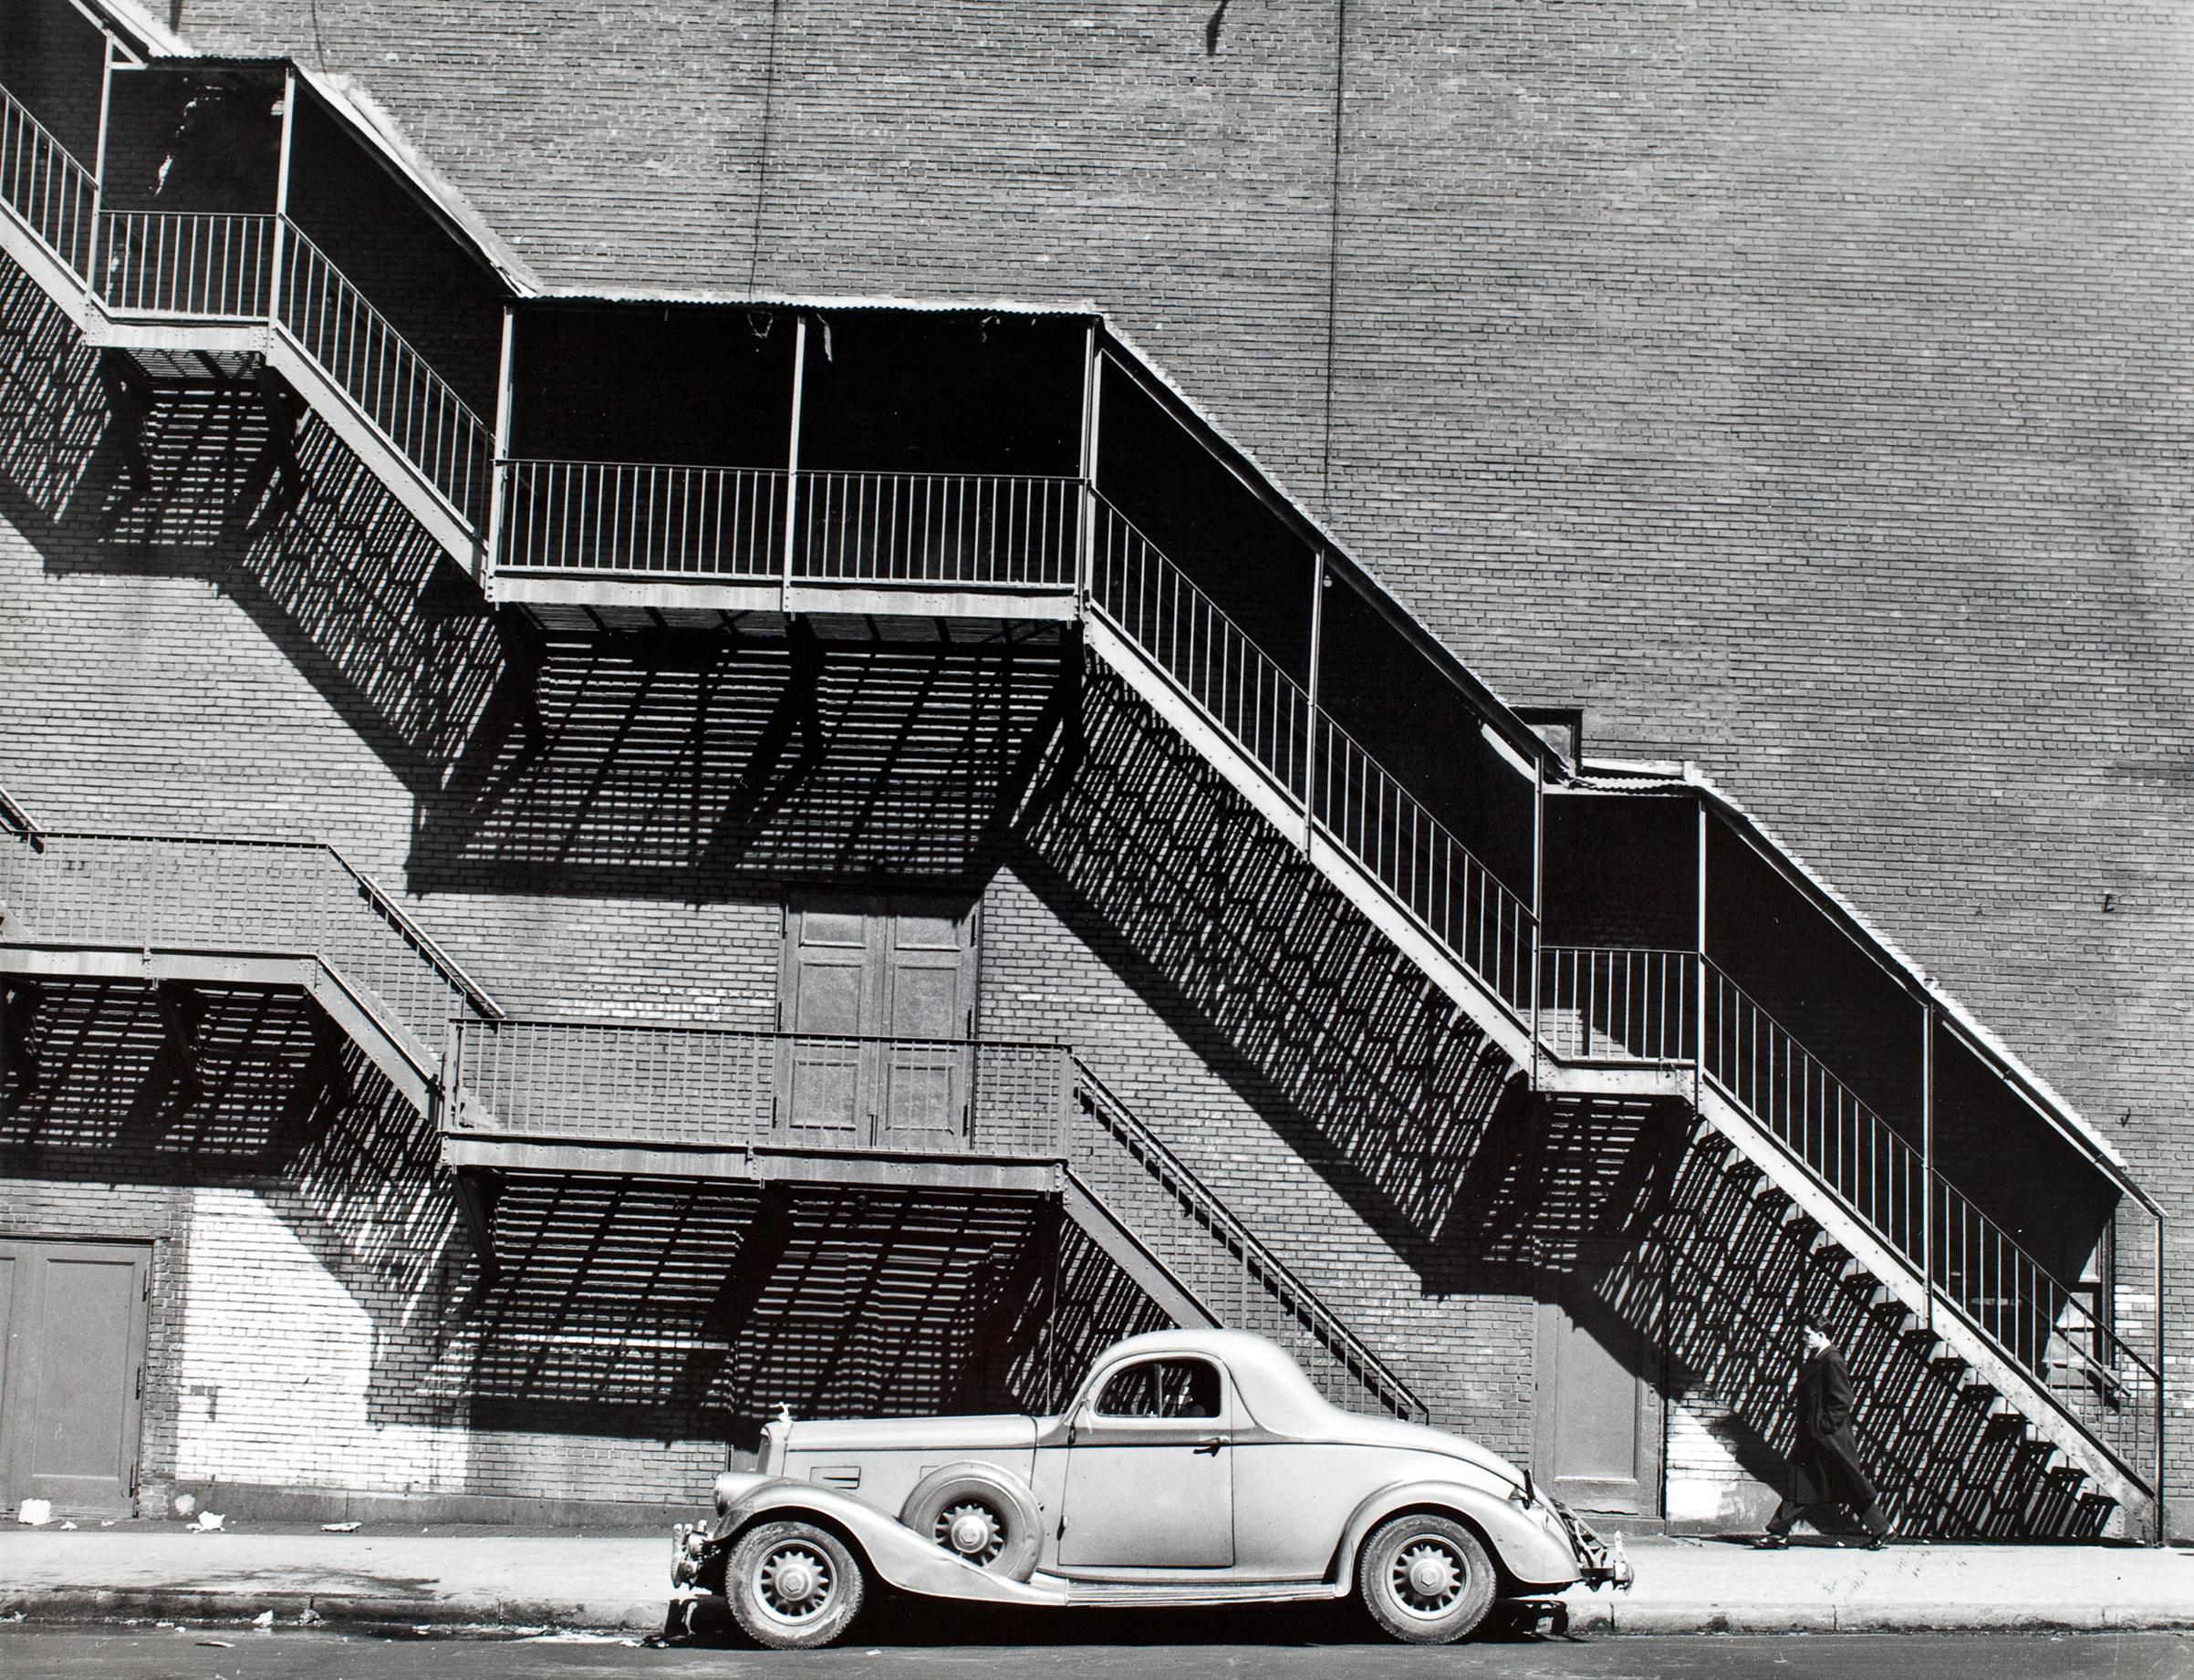 Mr. Perkin's Pierce-Arrow, Harlem, 1946.